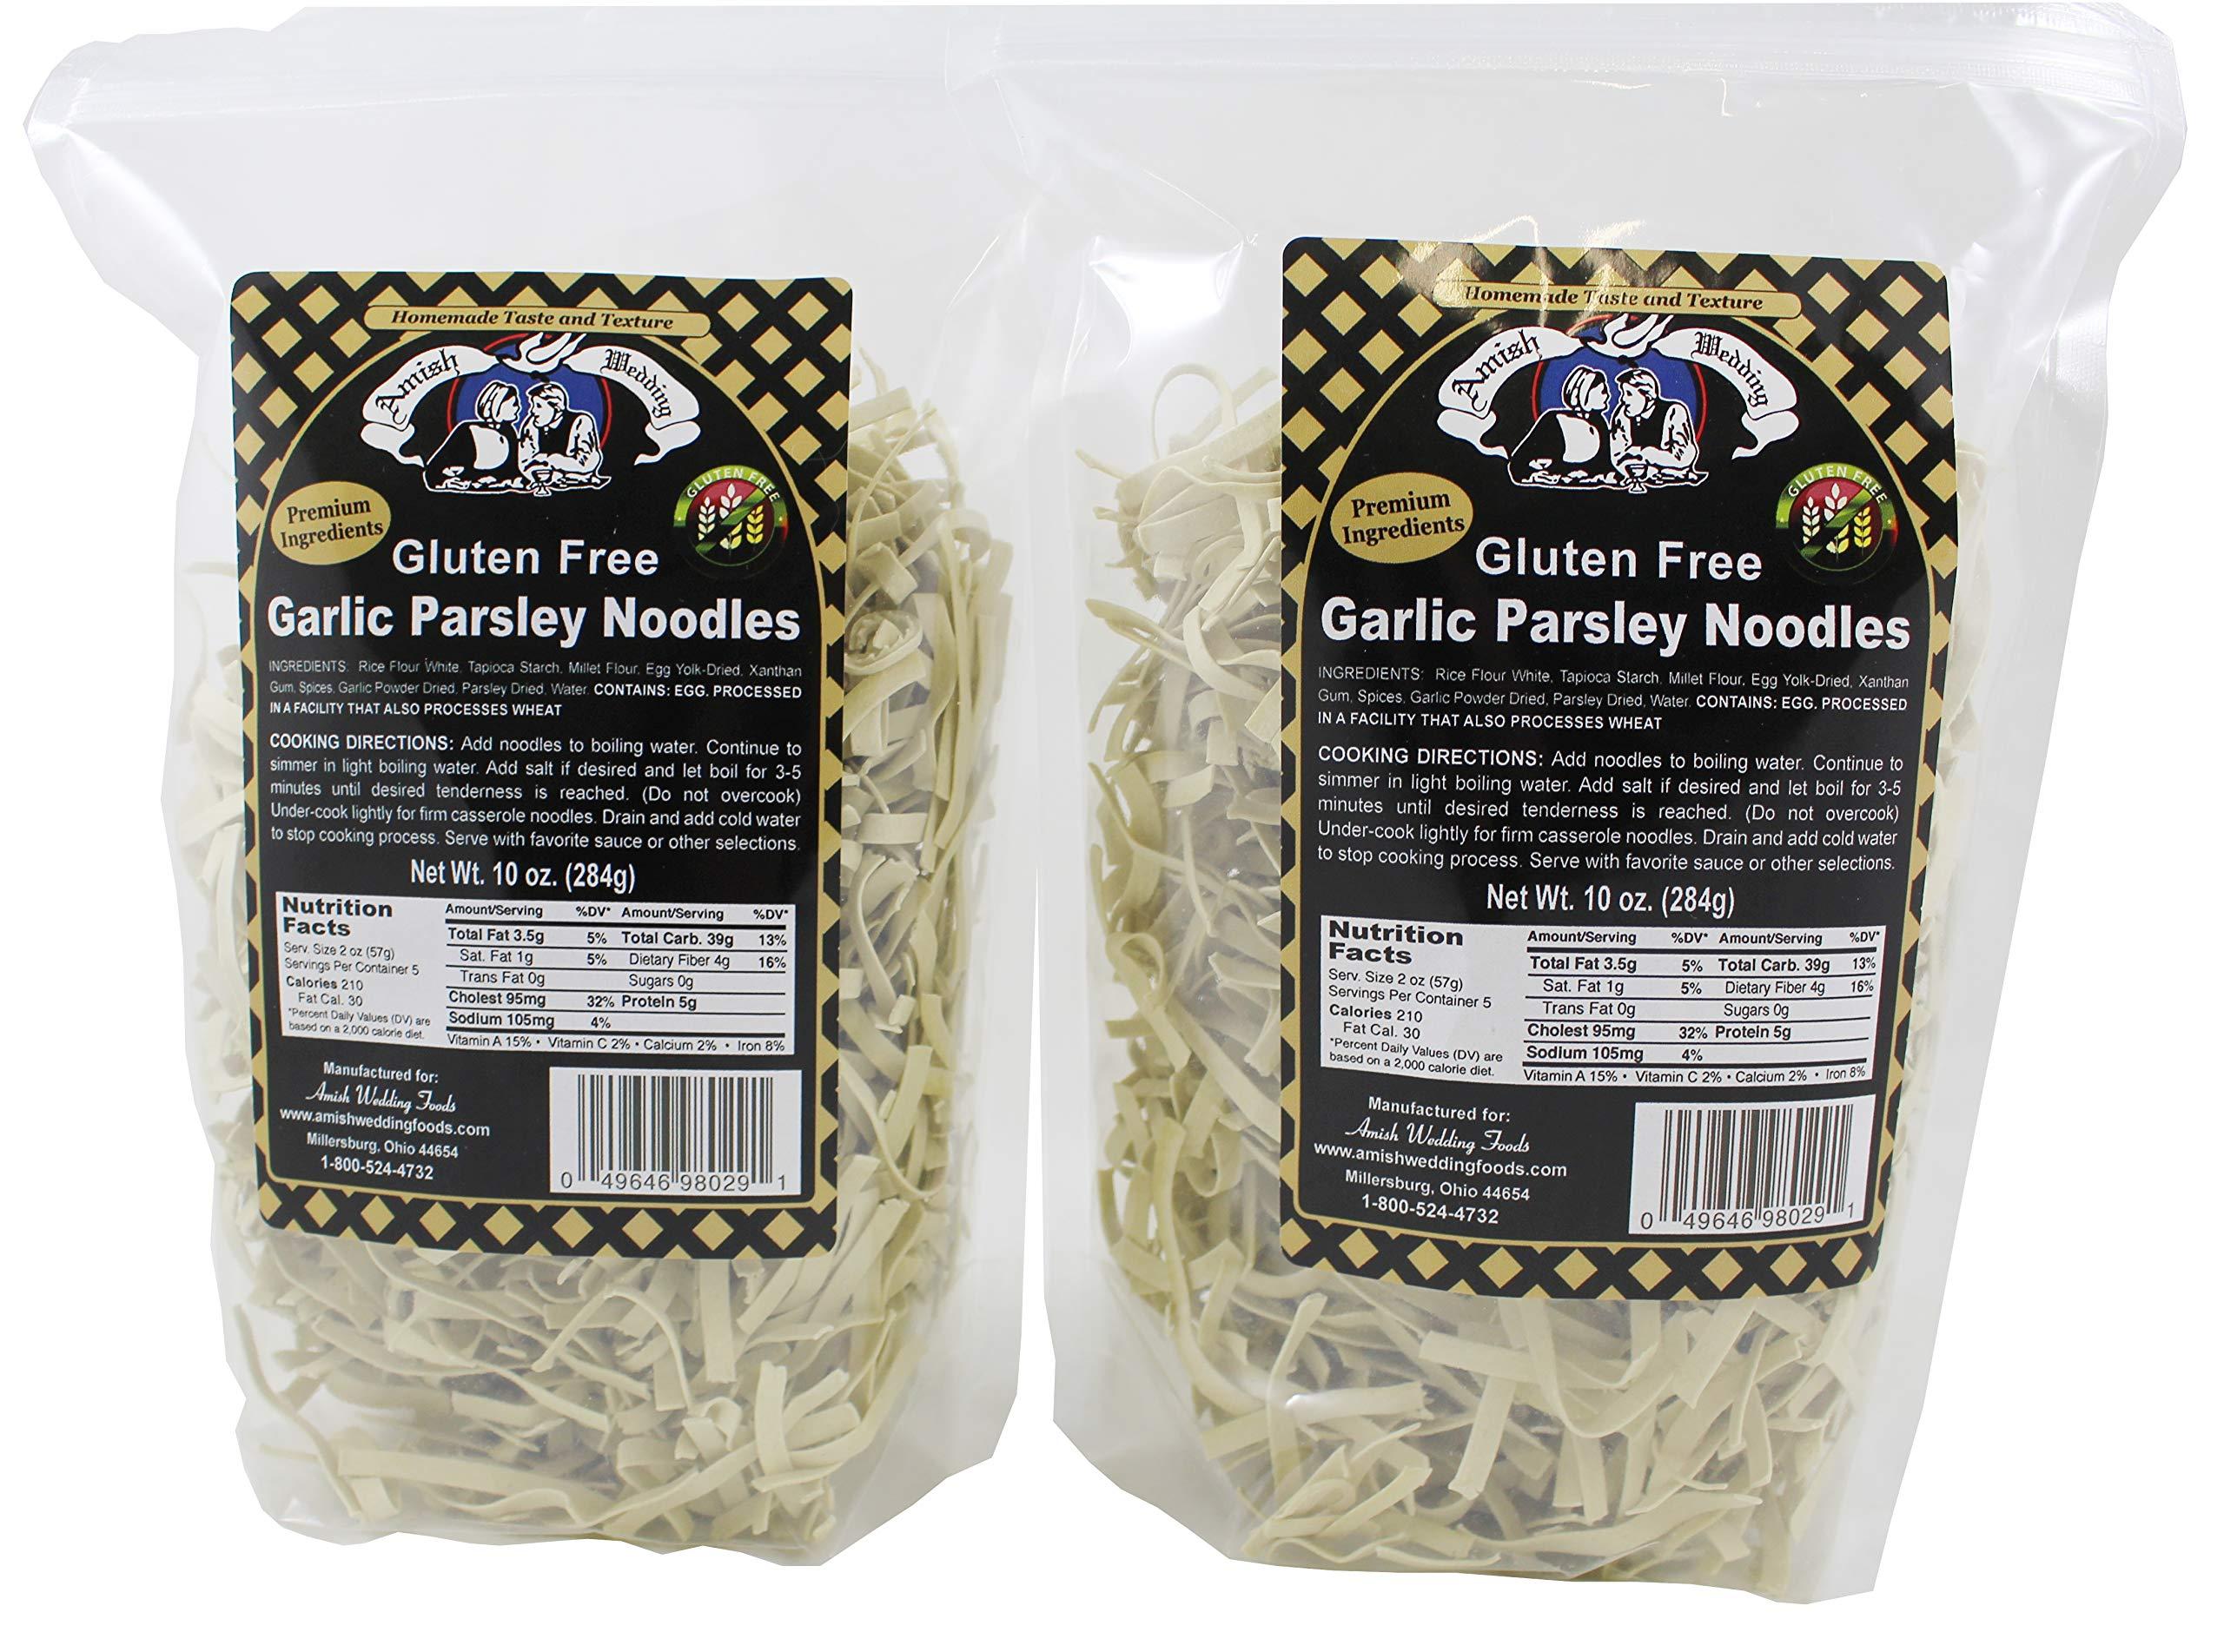 Amish Wedding Gluten Free Garlic Parsley Noodles, Two (2) 10oz Bags by Amish Wedding Foods